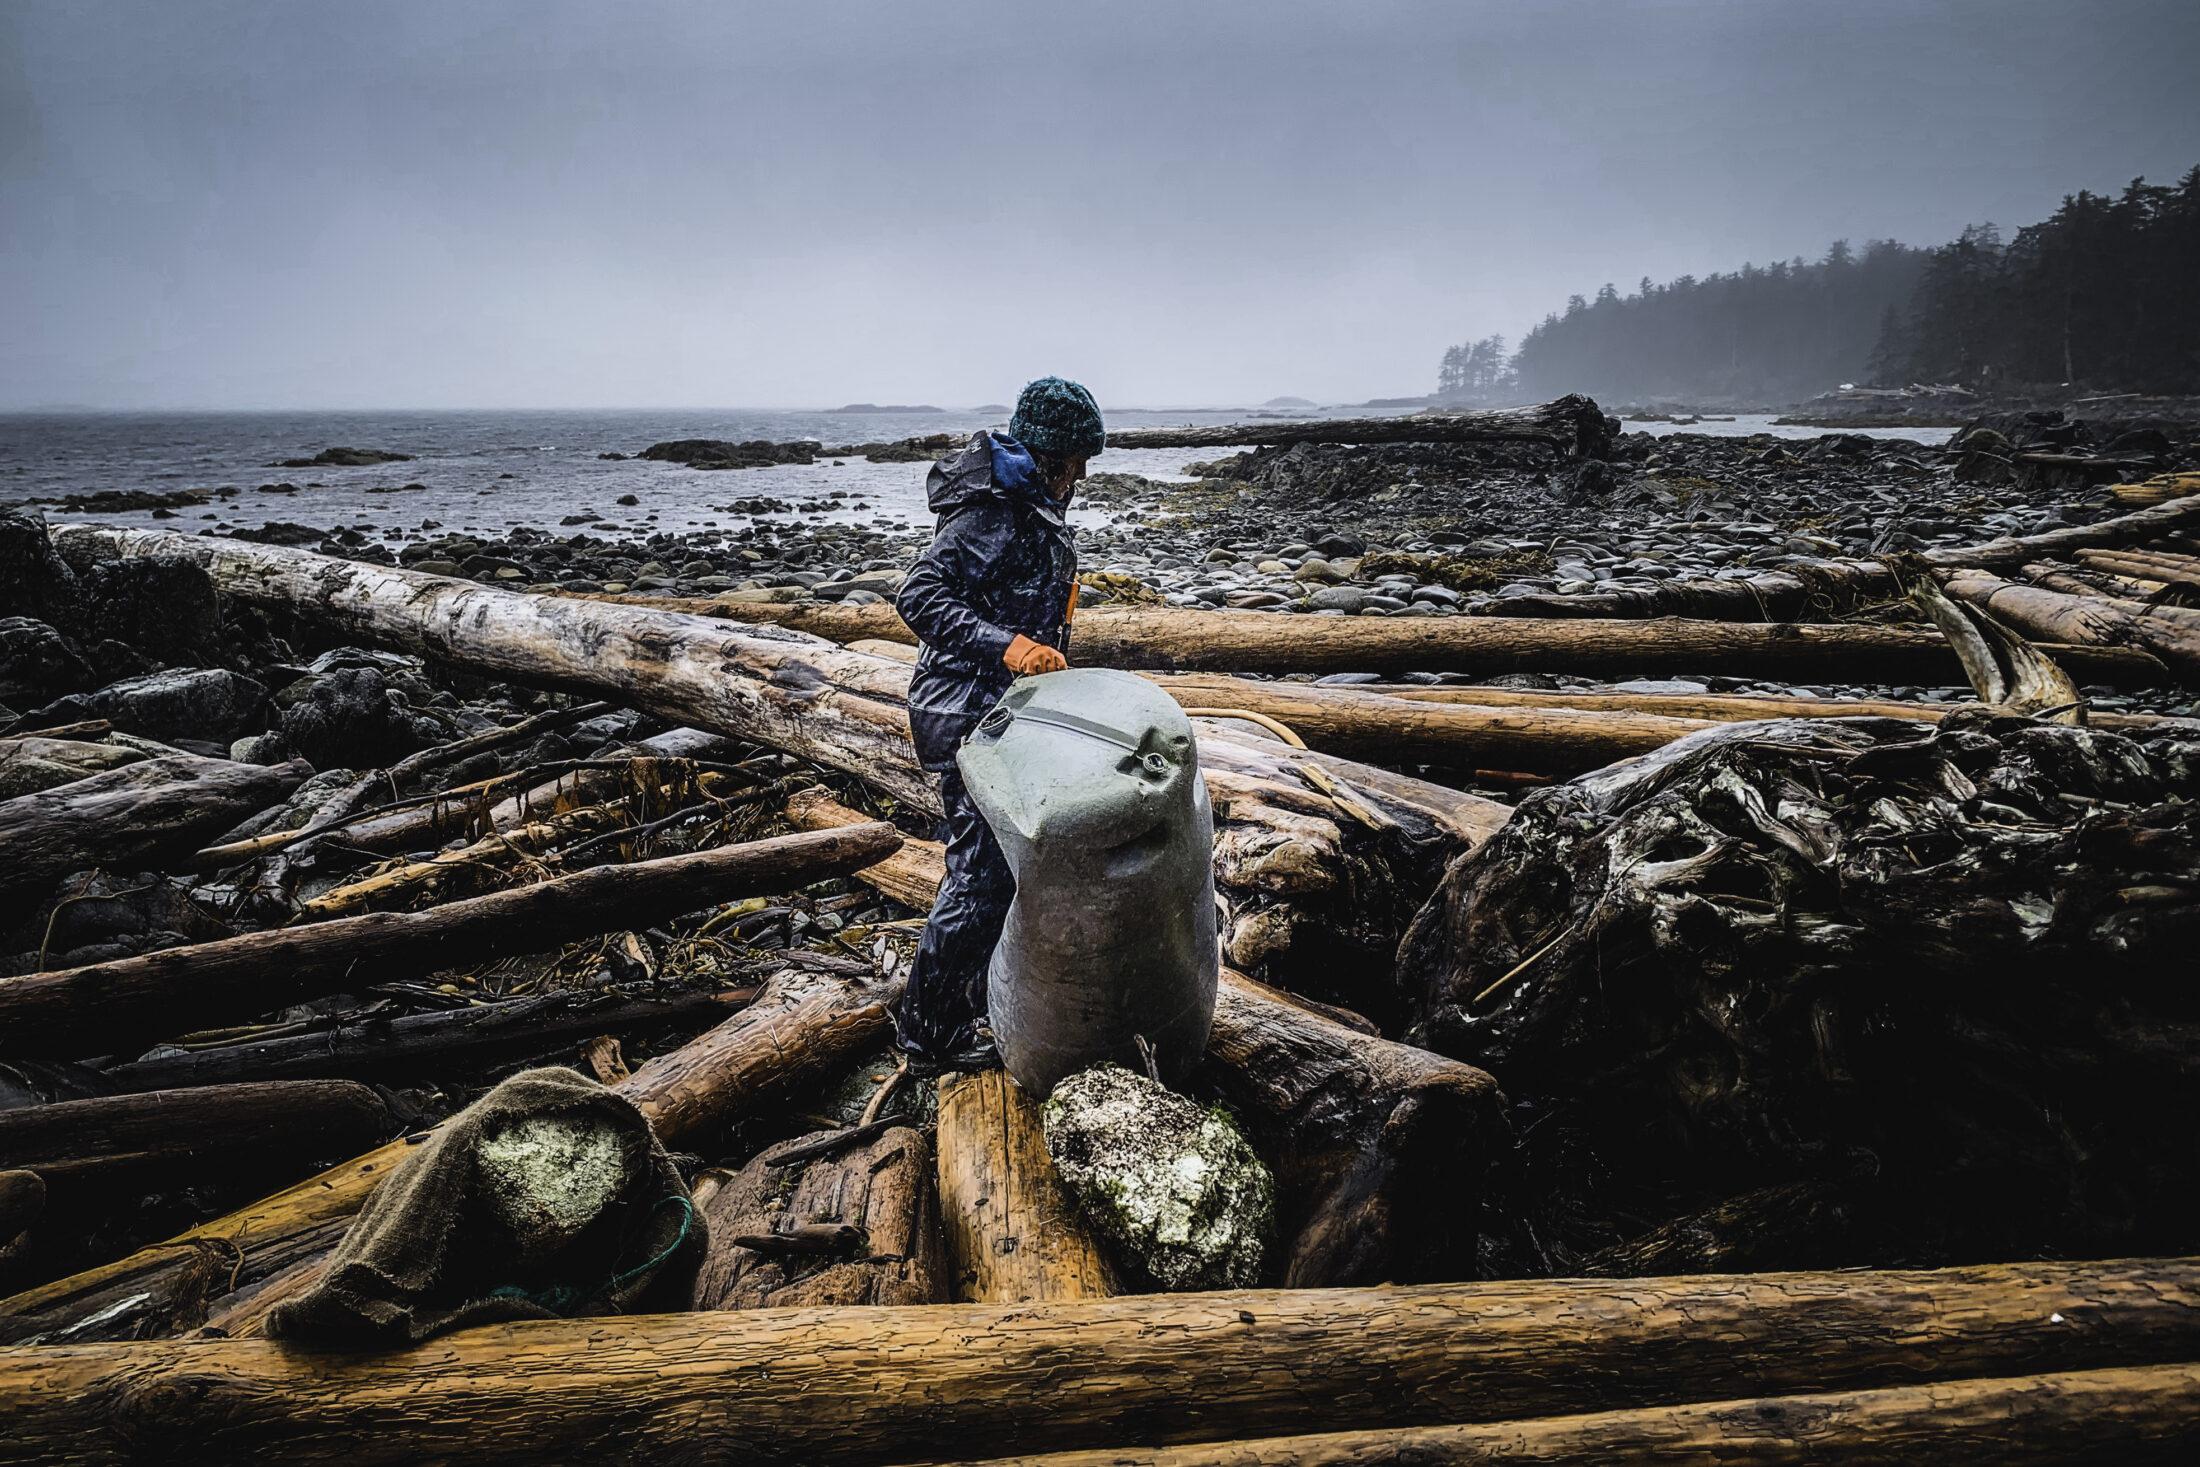 Moving debris, Clean Coast, Clean Waters Initiative